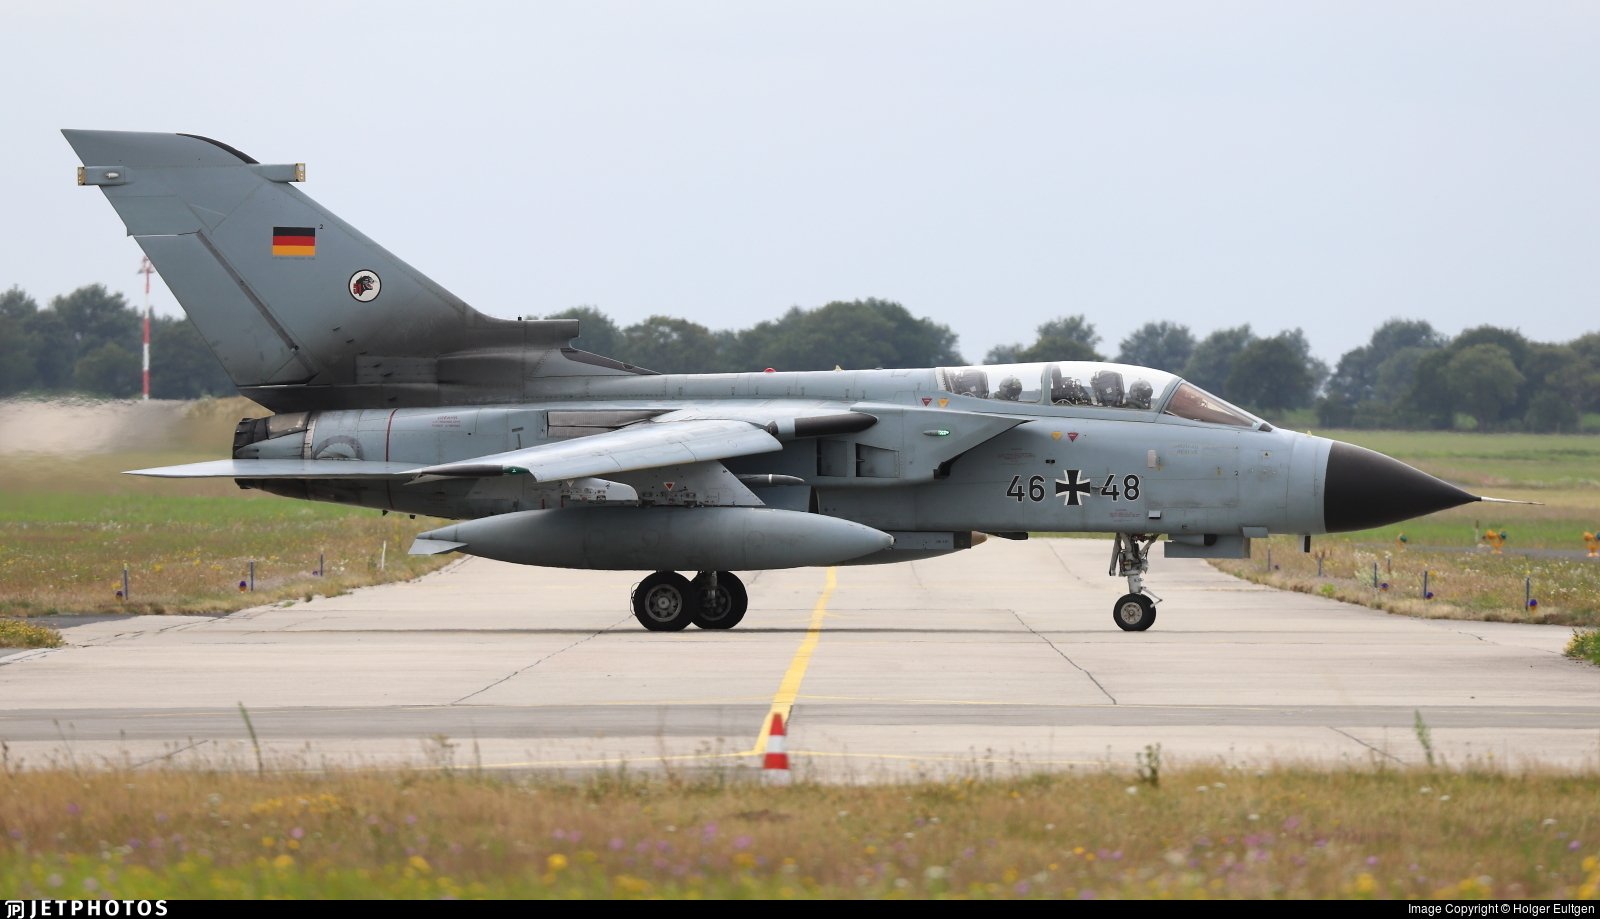 46-48 - Panavia Tornado ECR - Germany - Air Force